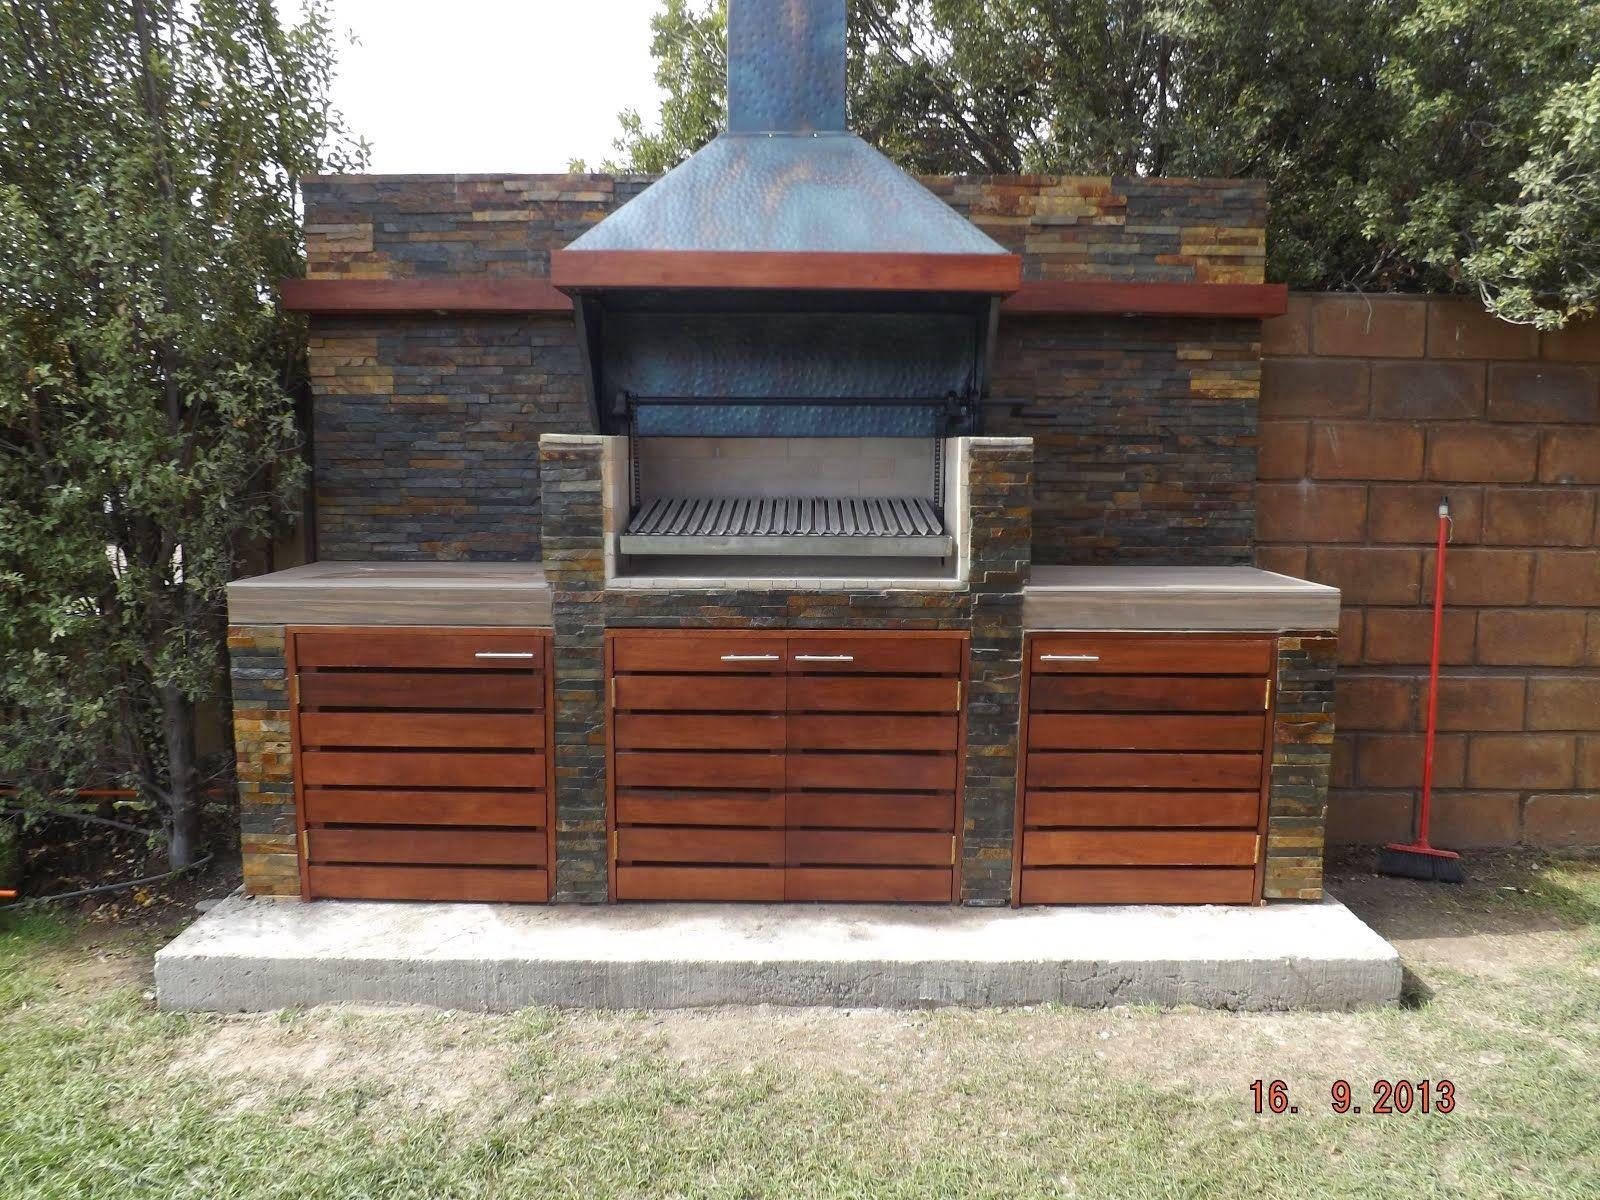 Quincho rquinteros terrazas outdoor kitchen design bbq area garden y patio - Hornos para casa ...